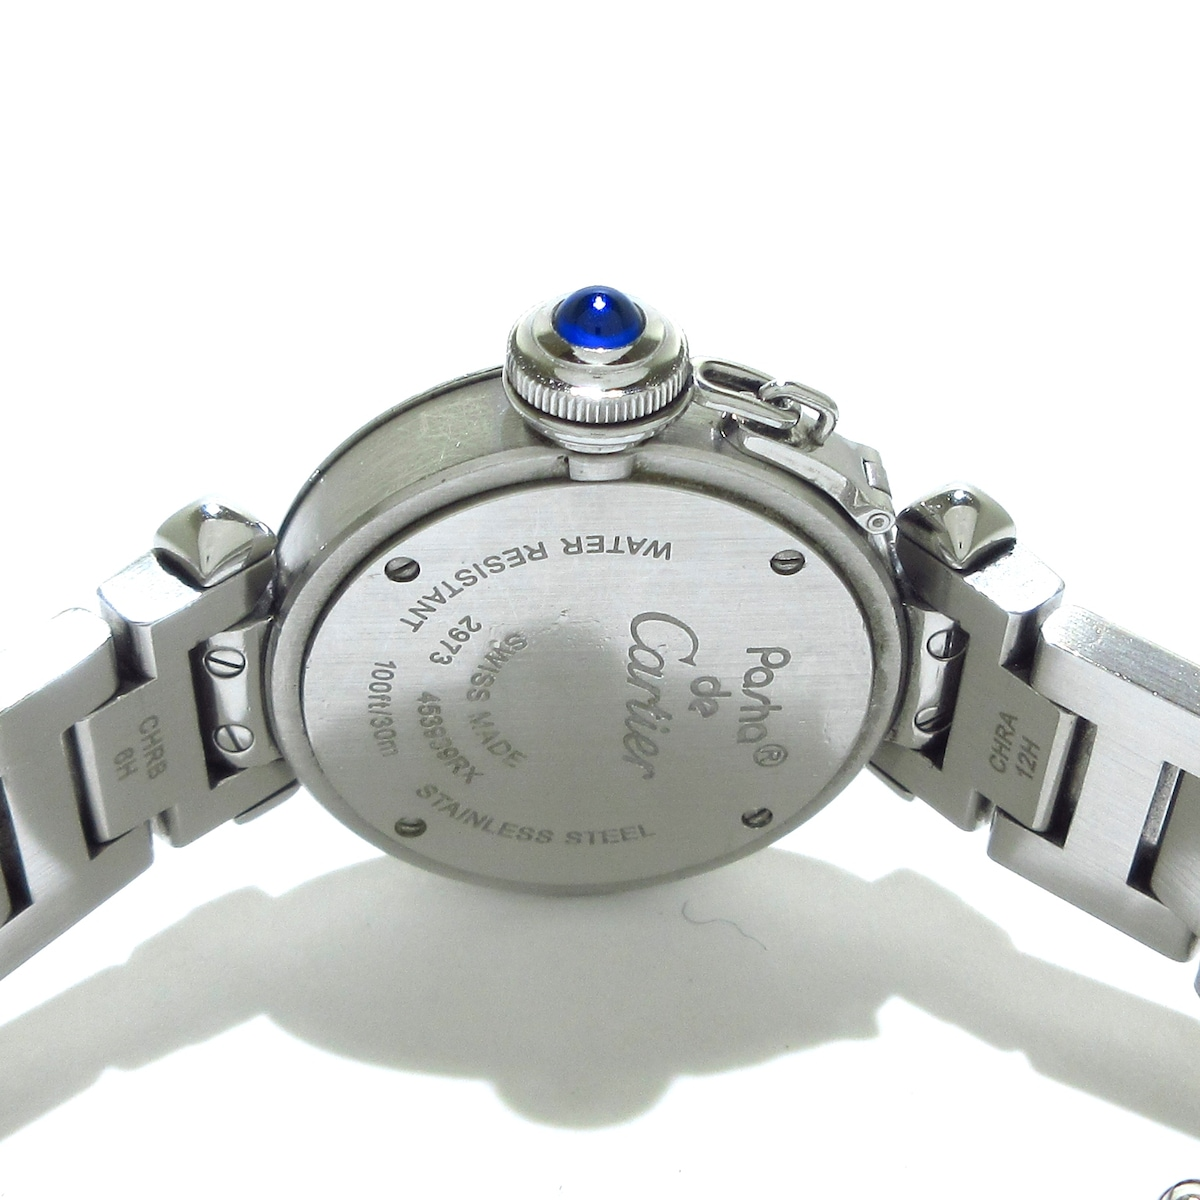 Cartier(カルティエ)のミスパシャSM